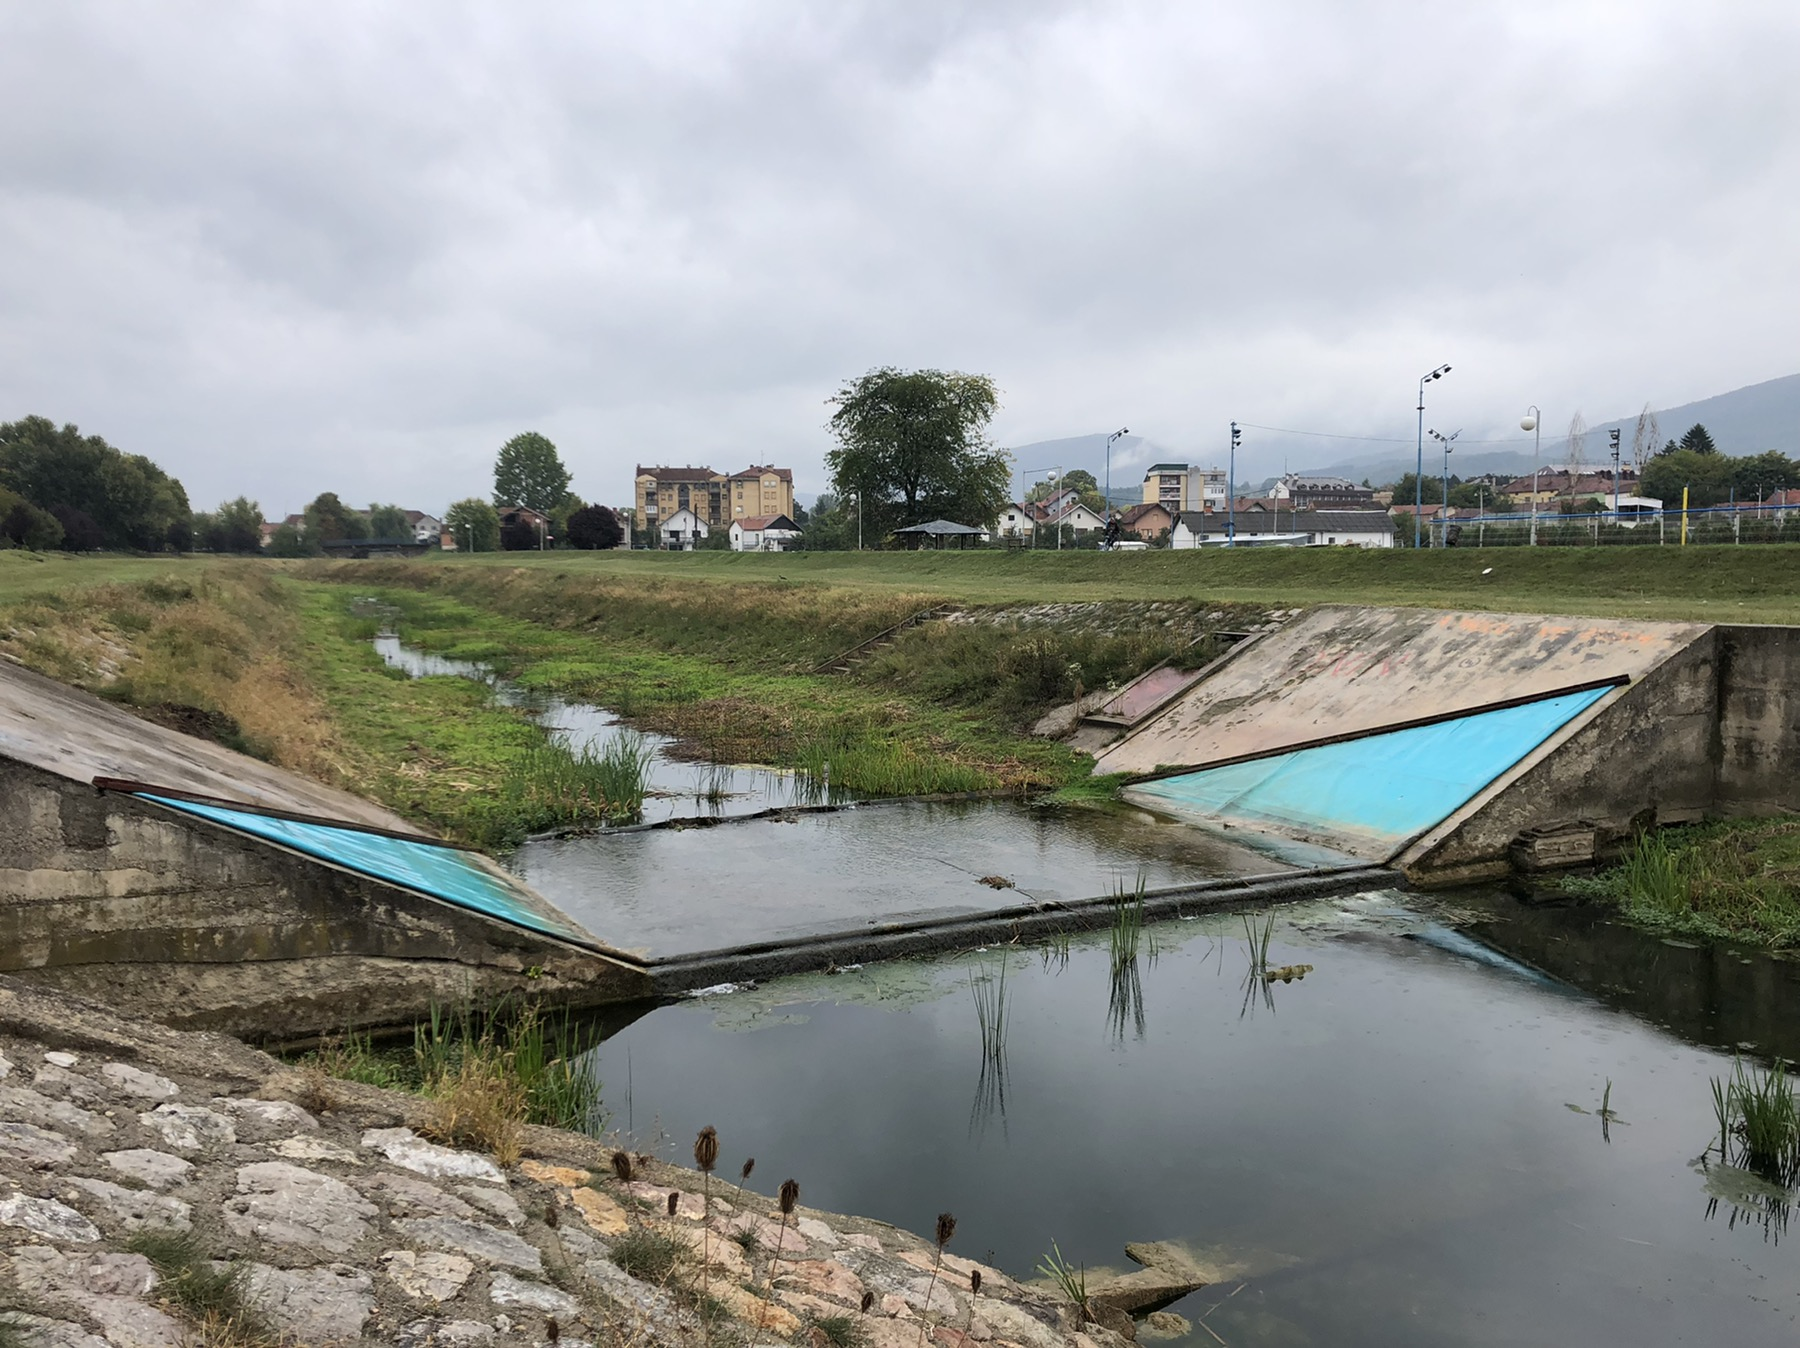 Brana, reka Svrljiški Timok, foto: Svrljiške novine